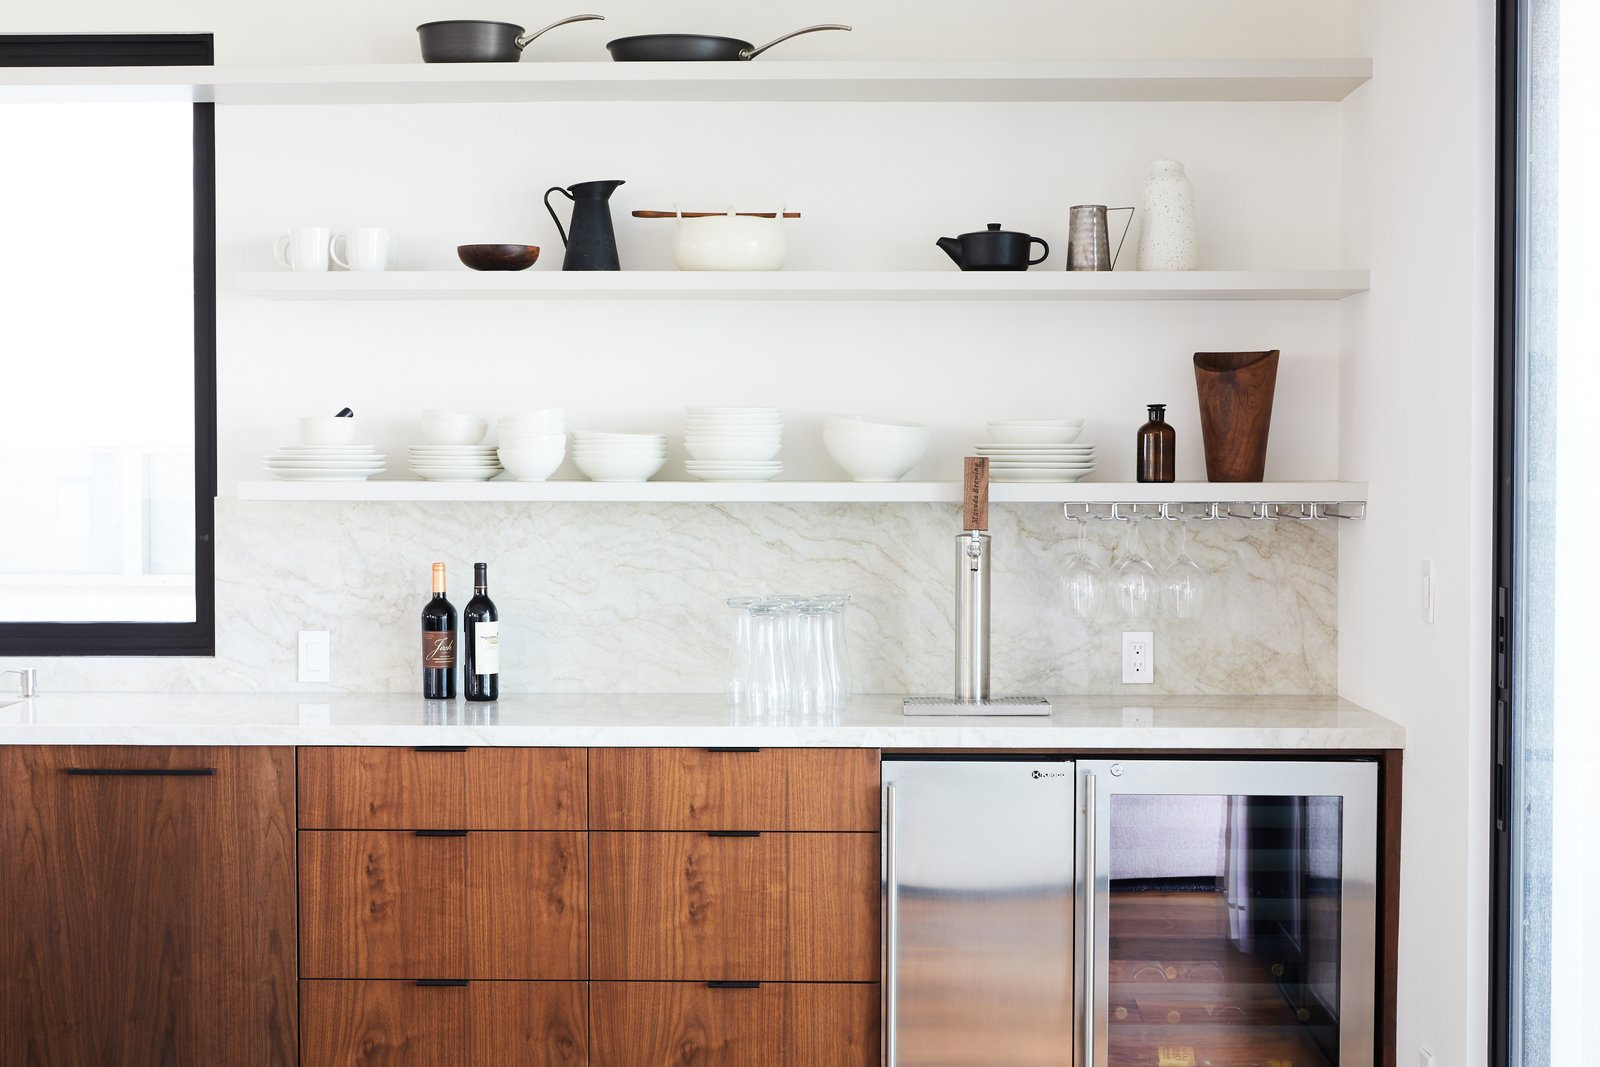 Kitchen, Marble Counter, Beverage Center, Wine Cooler, Stone Slab Backsplashe, and Open Cabinet Kitchen  The Strand Residence